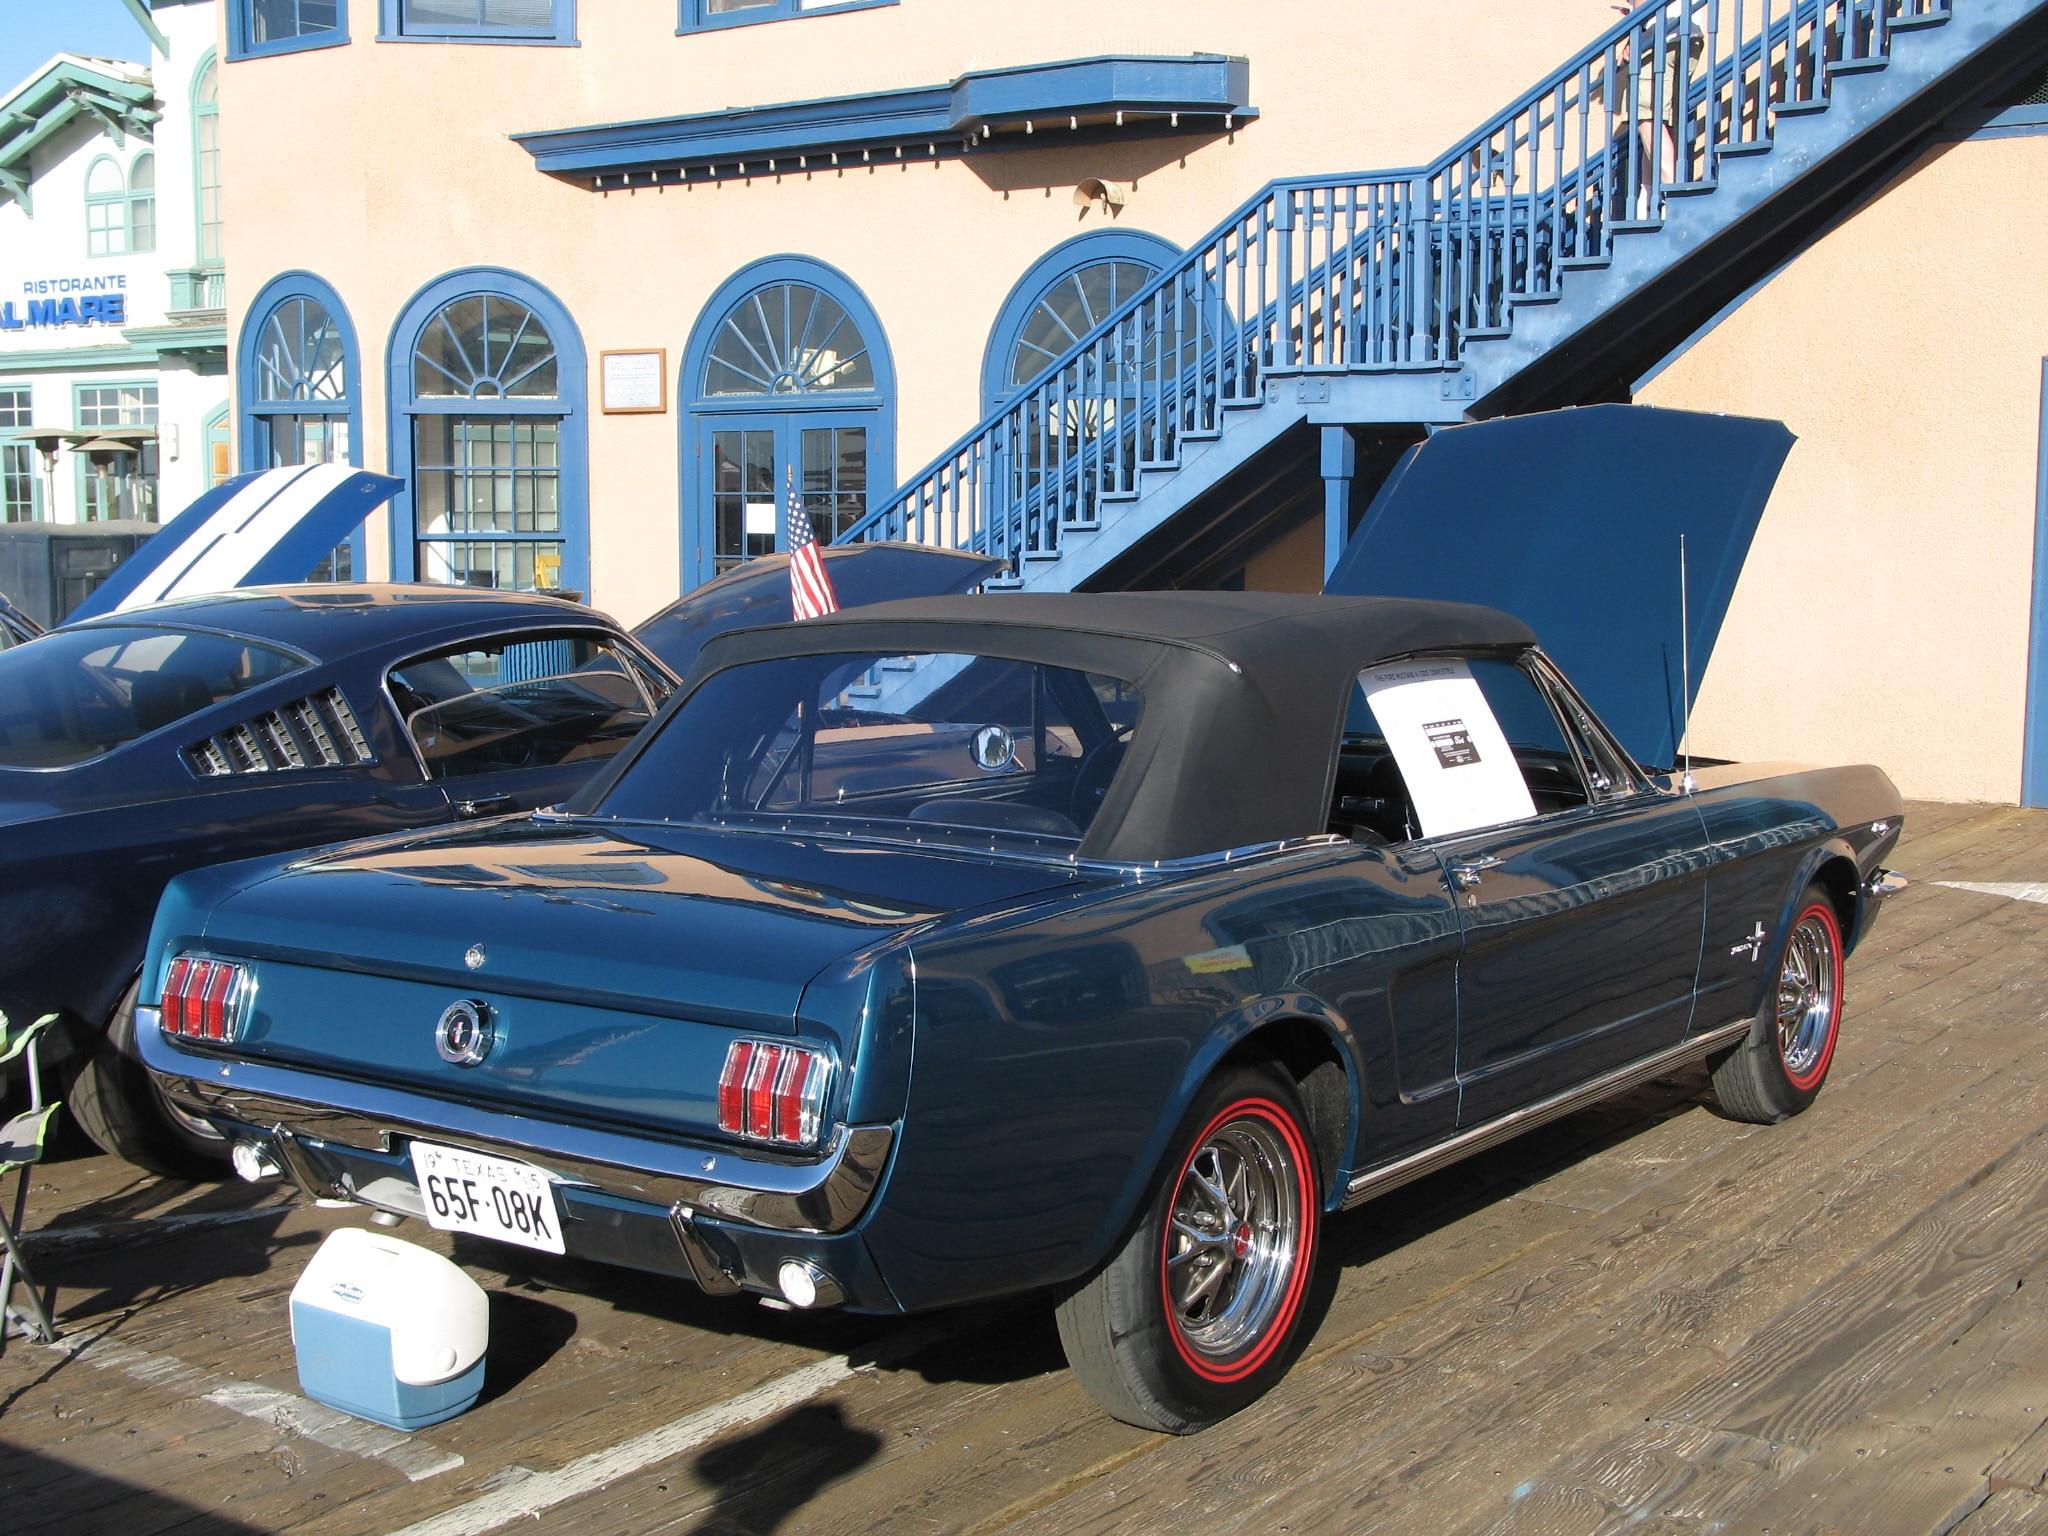 2016 Shelbys On Santa Monica Pier Lasaac 35